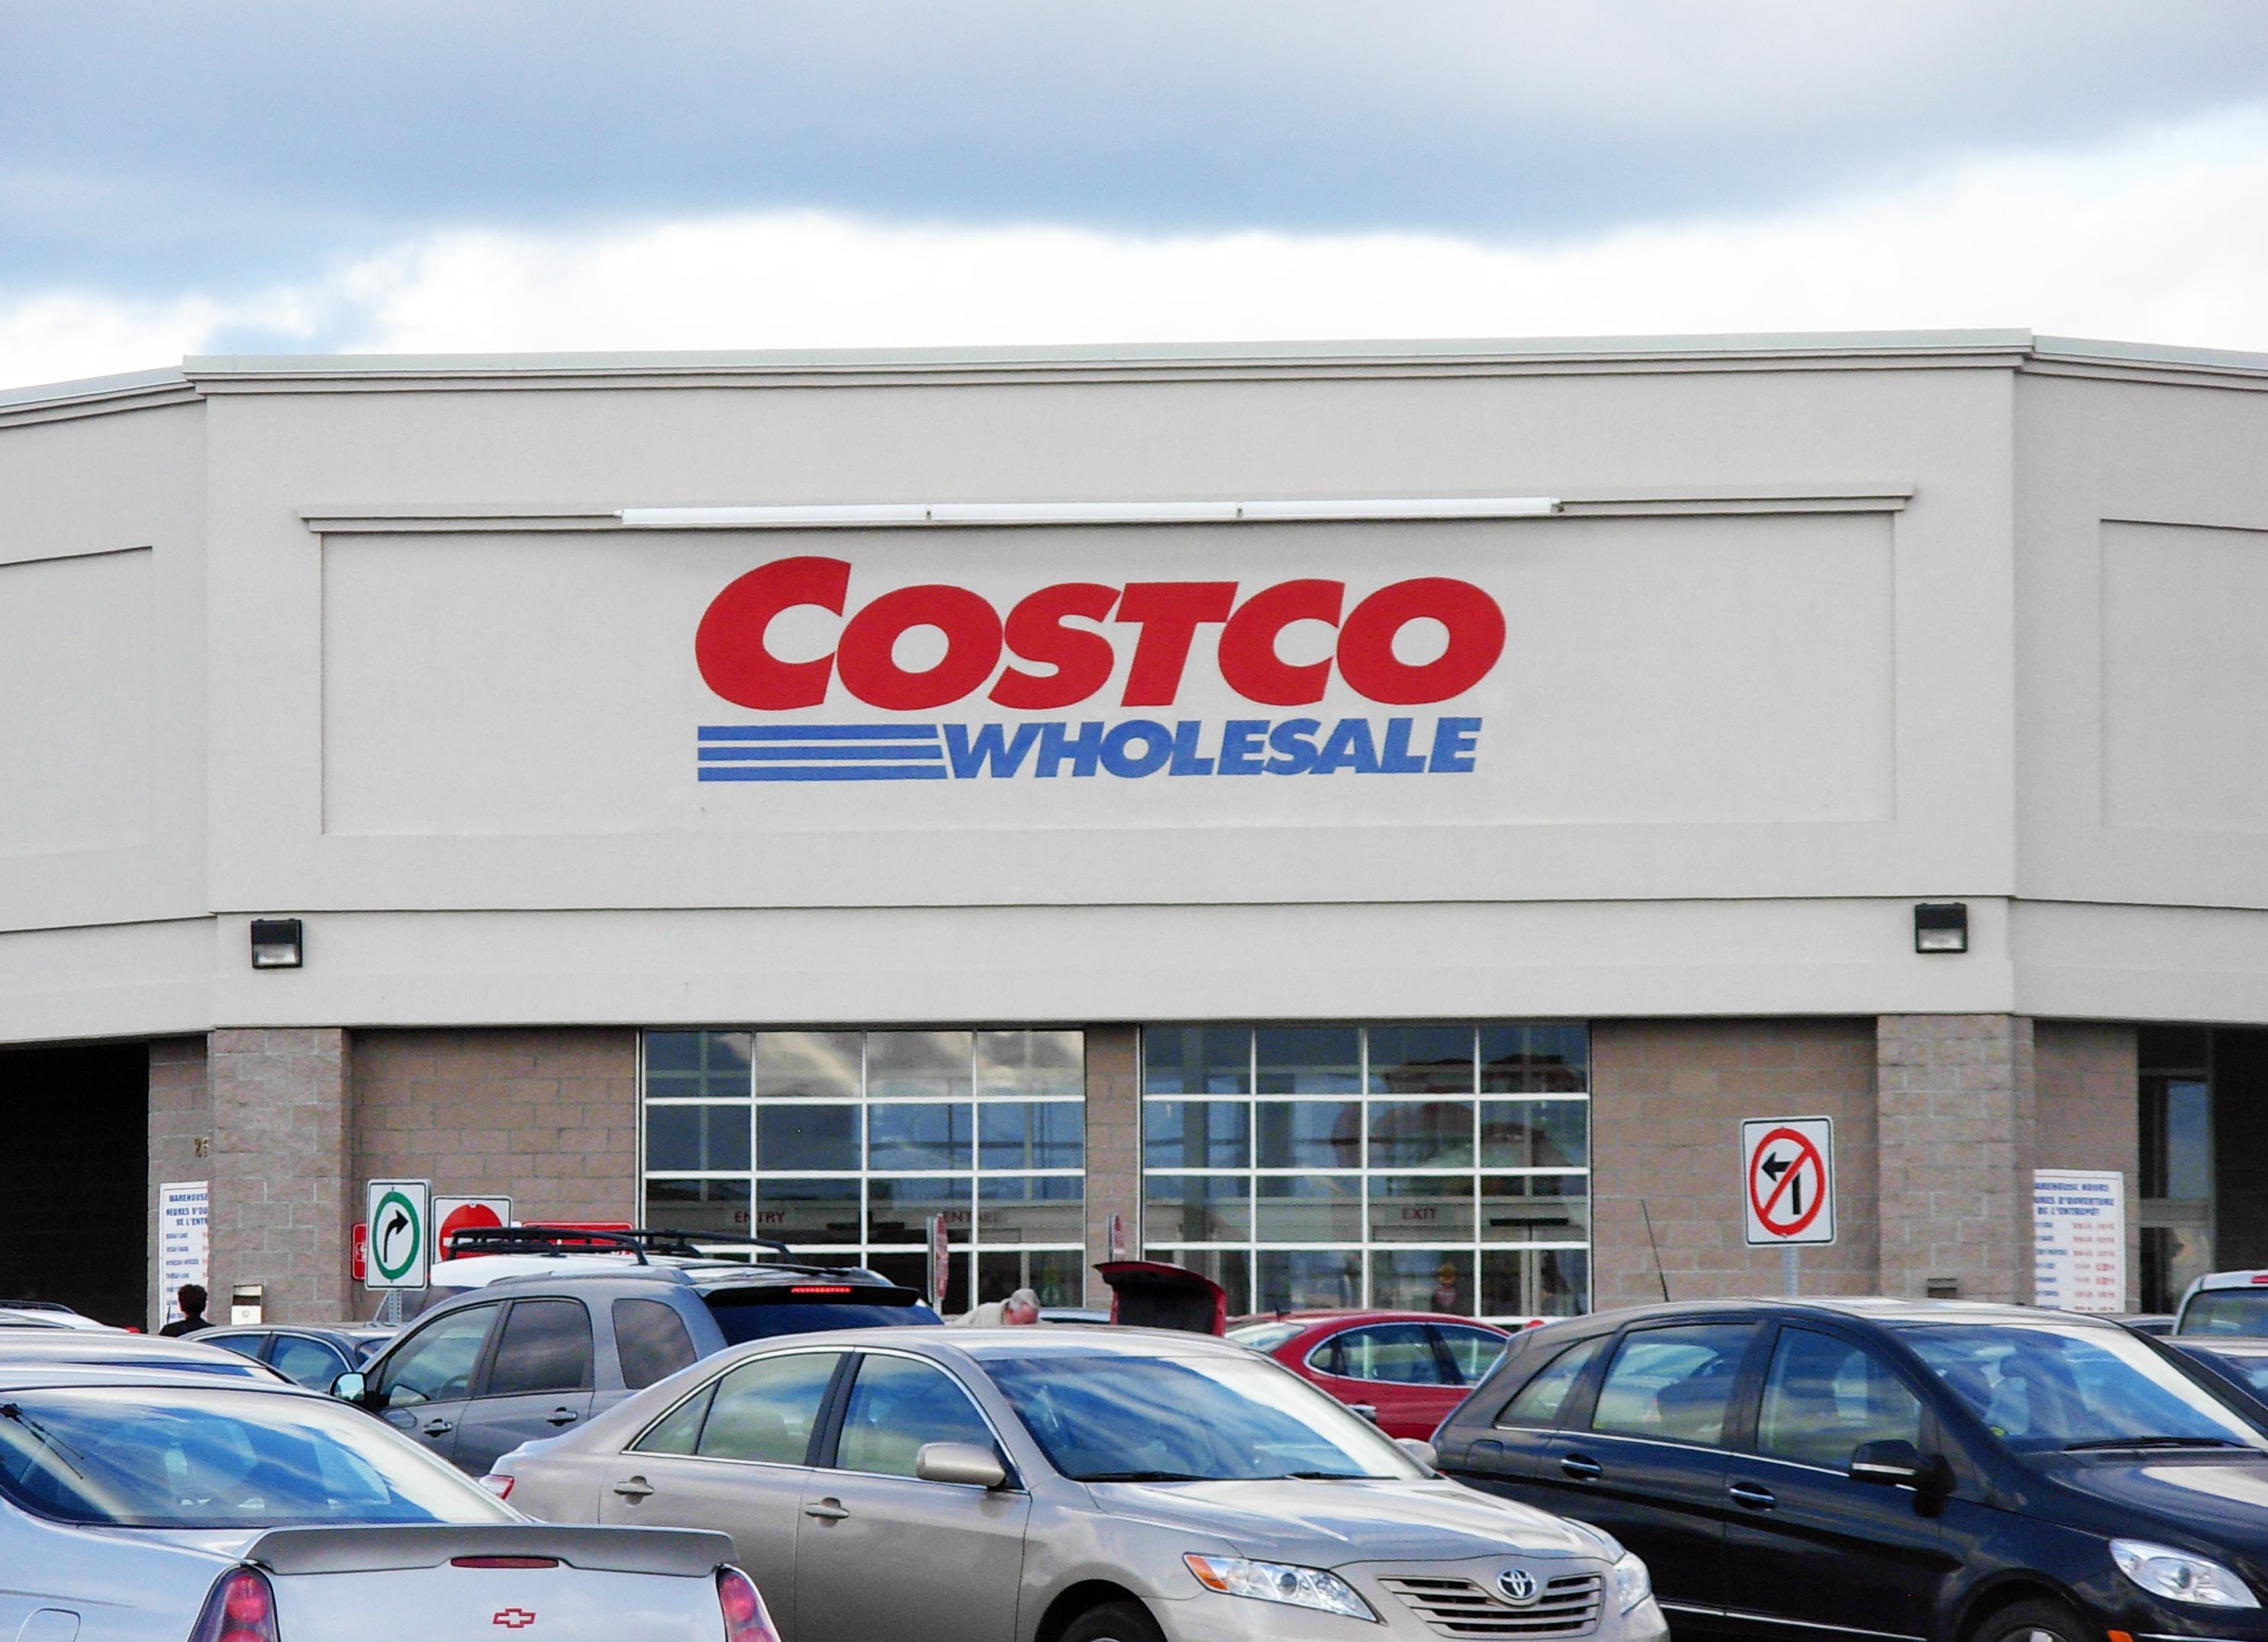 Costco Corporate Office  Corporate Office HQ